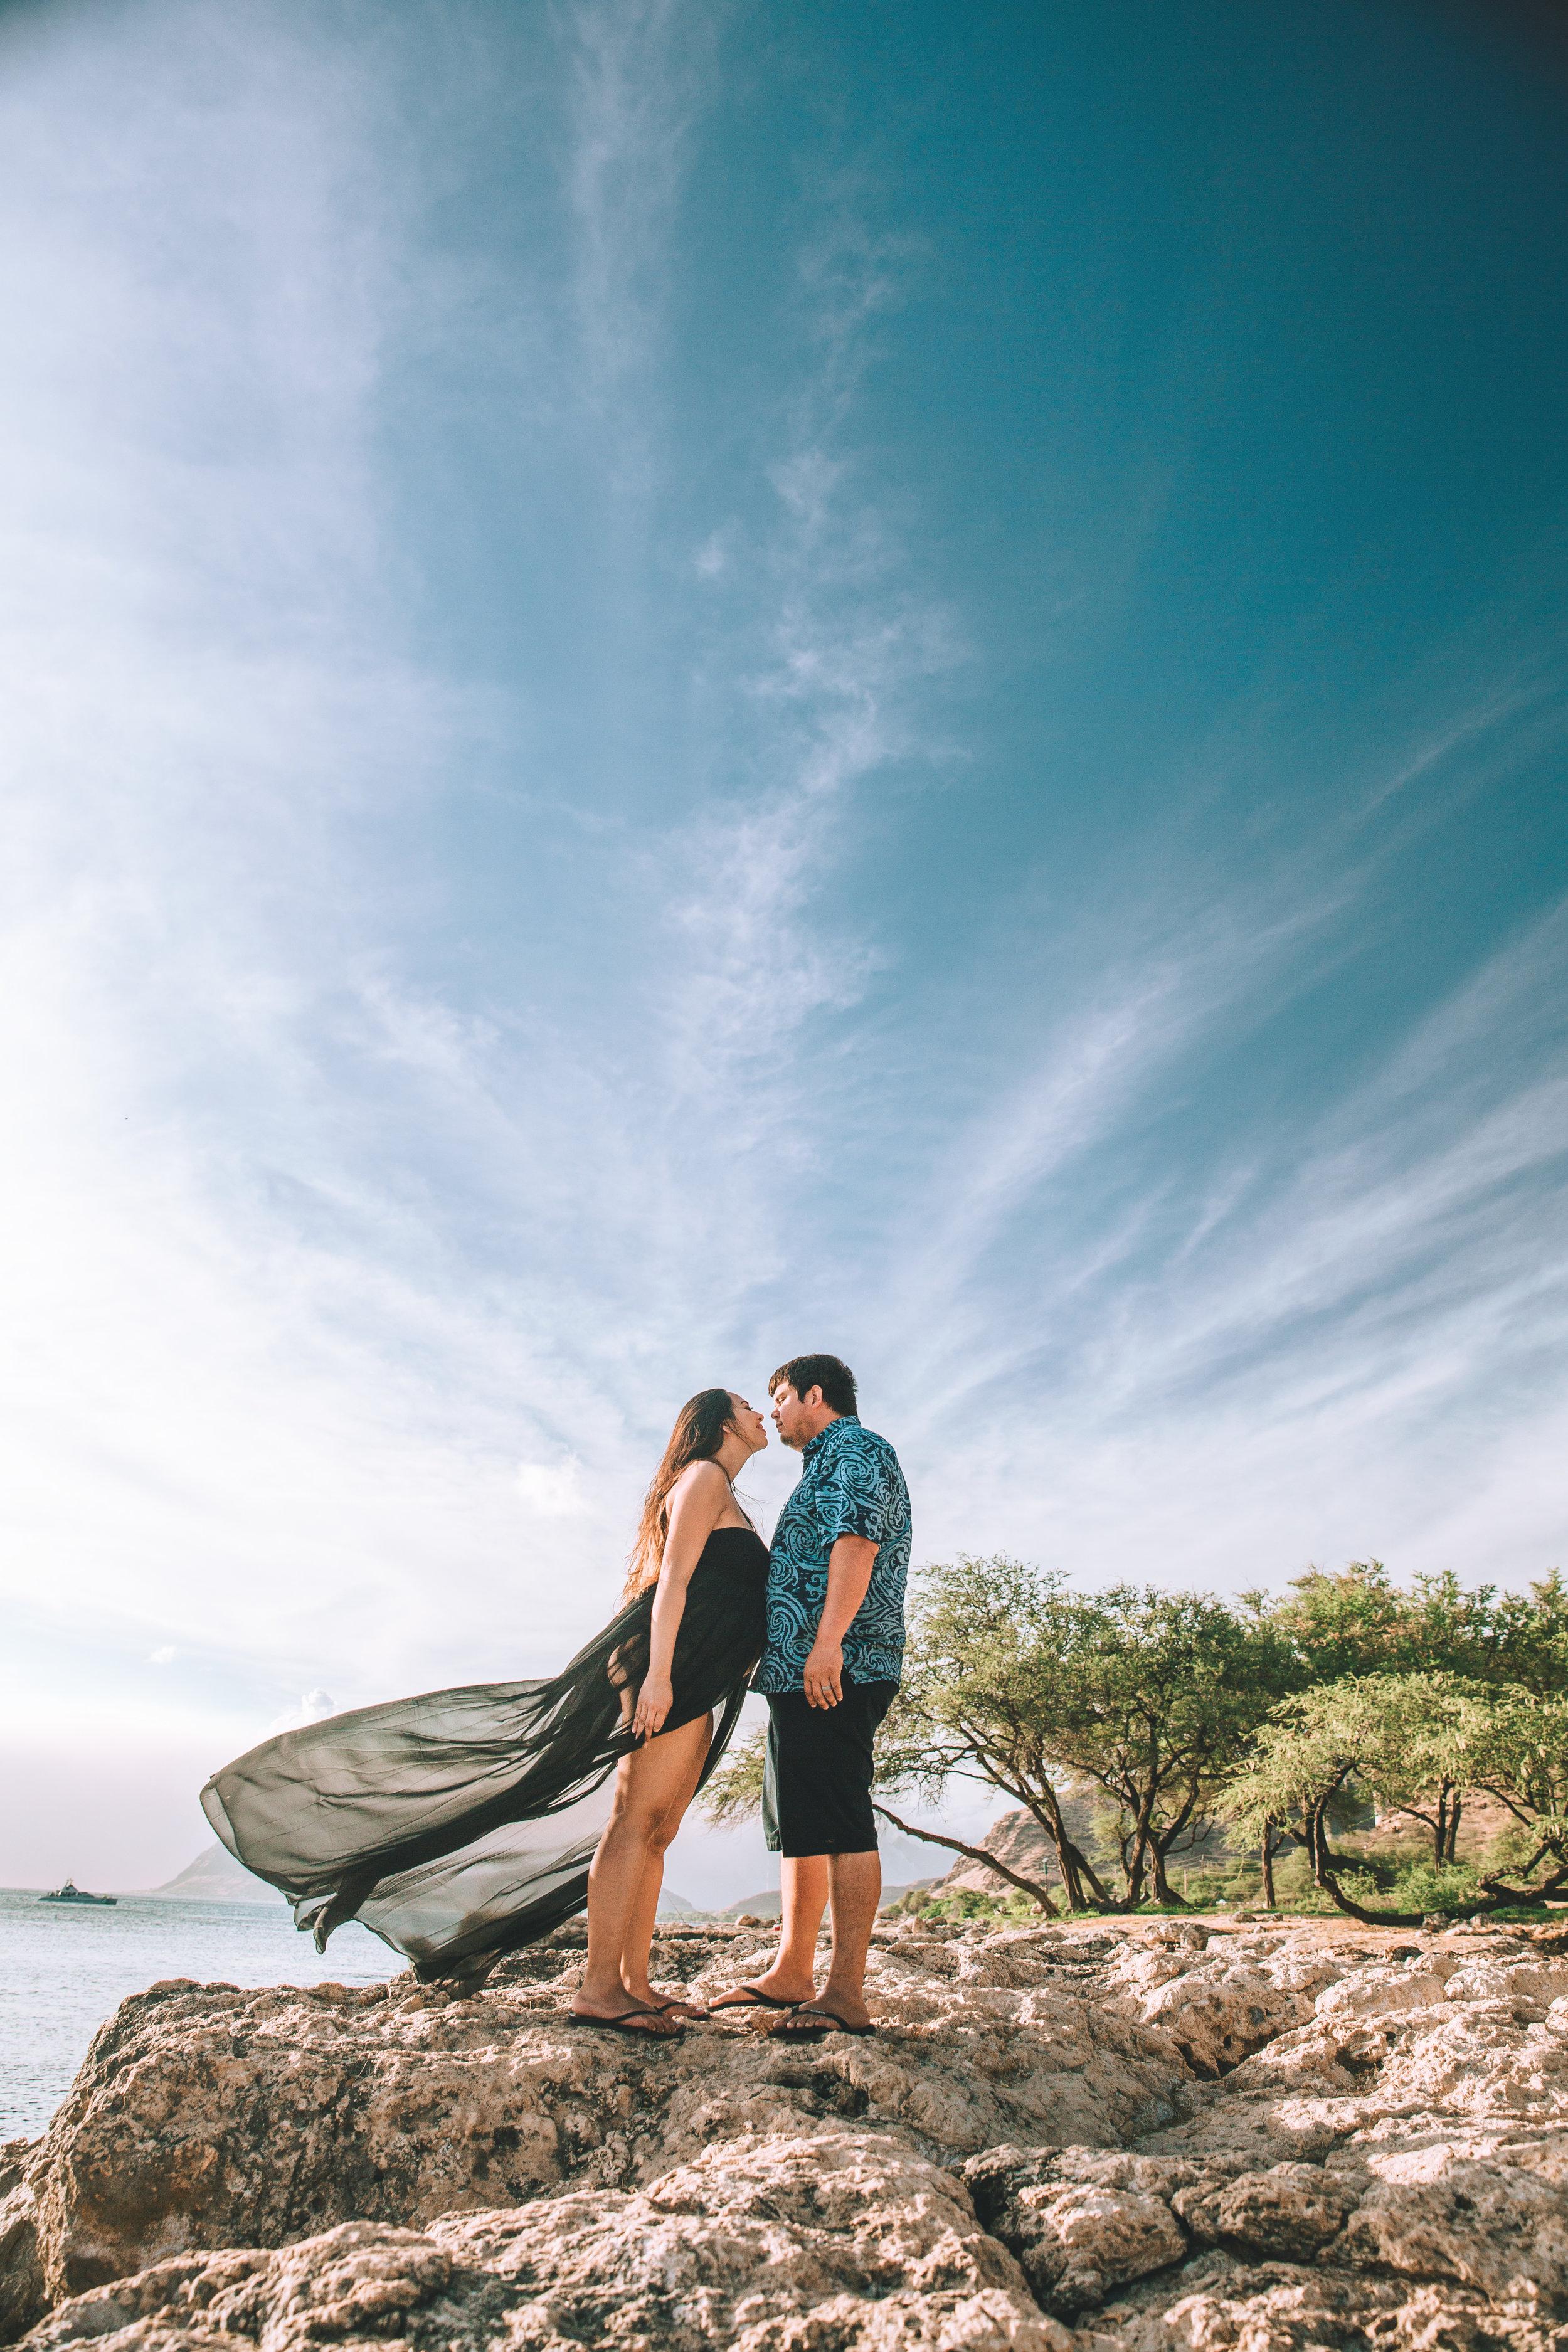 Hawai'i photographer, Oahu photographer, Oahu photography, honolulu photographer, Hawaii maternity photographer, Hawaii maternity photography, genkiphotos, genkimedia, maternity photos